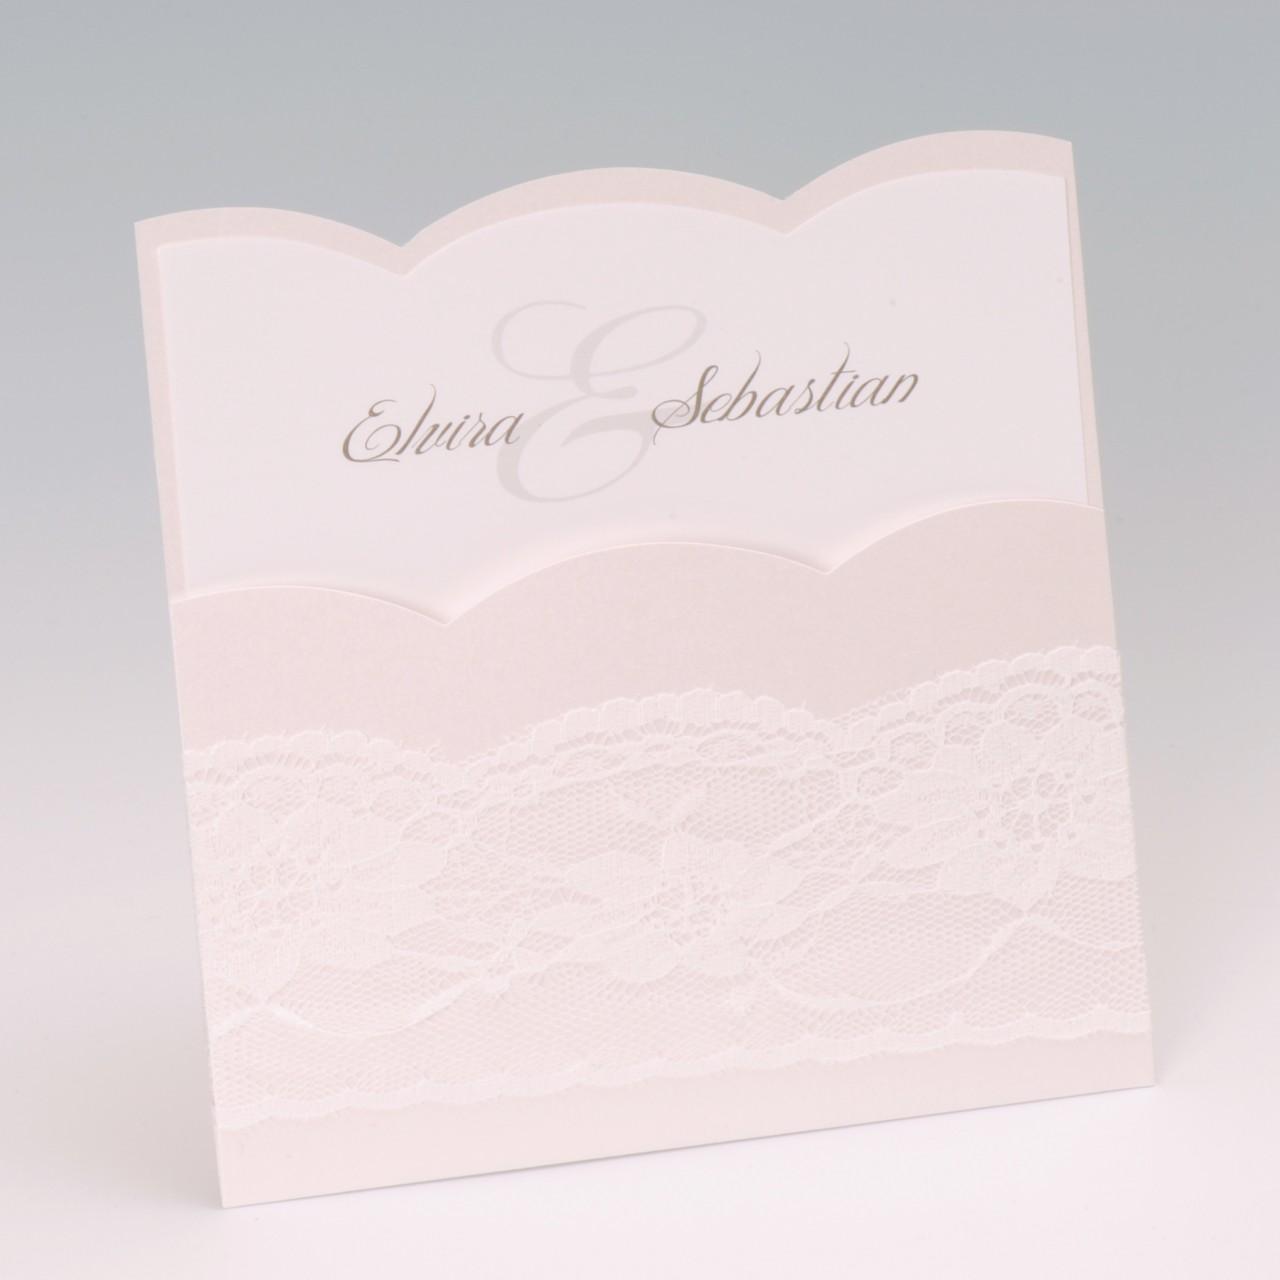 Einladungskarte - H 1991